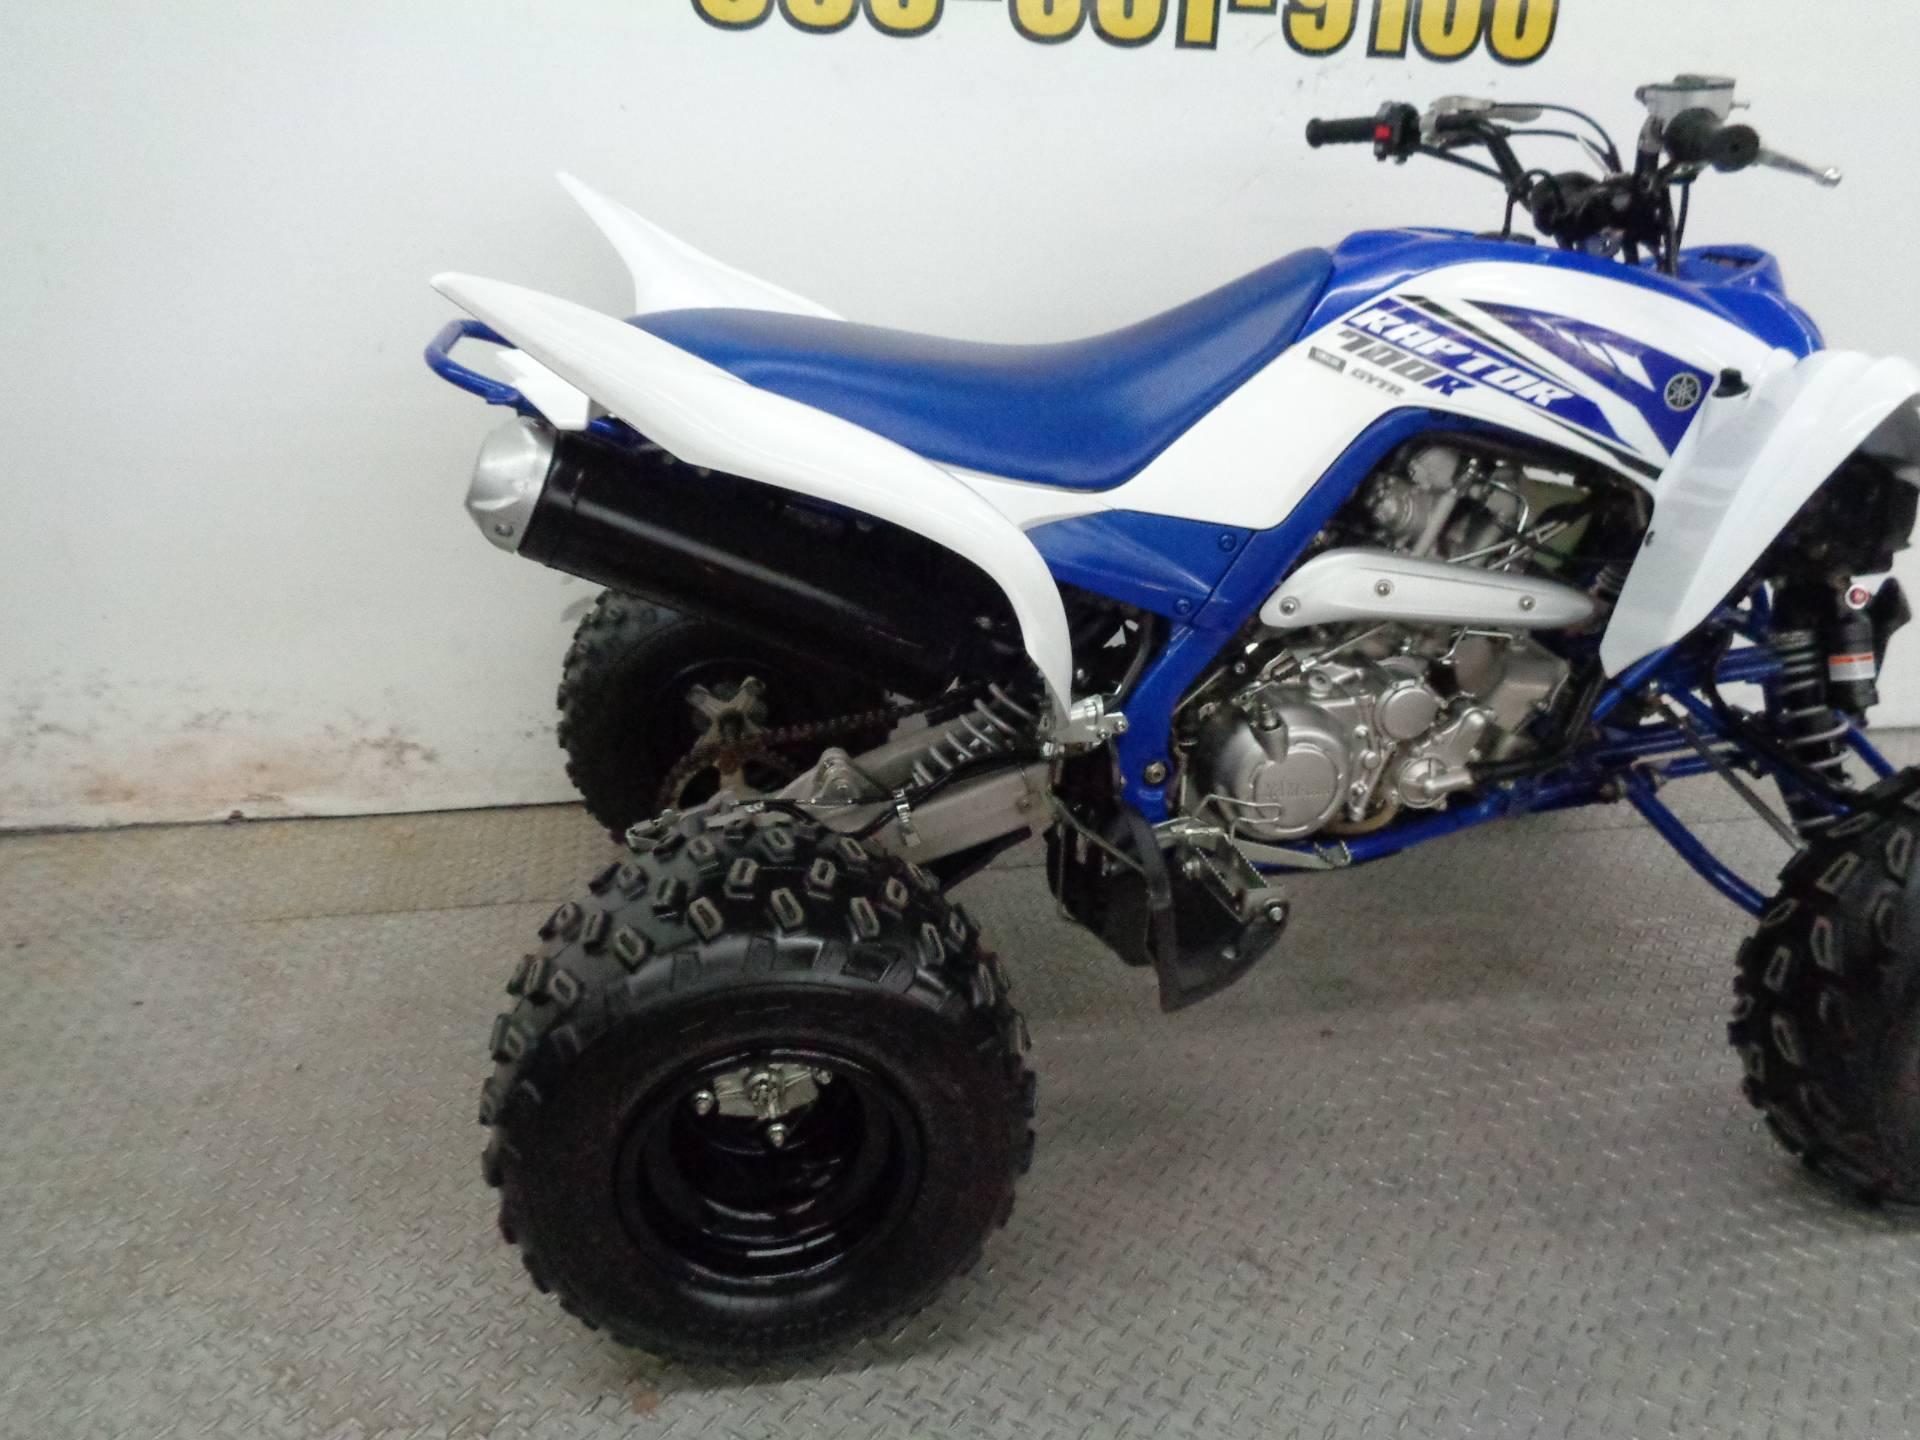 2017 Yamaha Raptor 700R 7